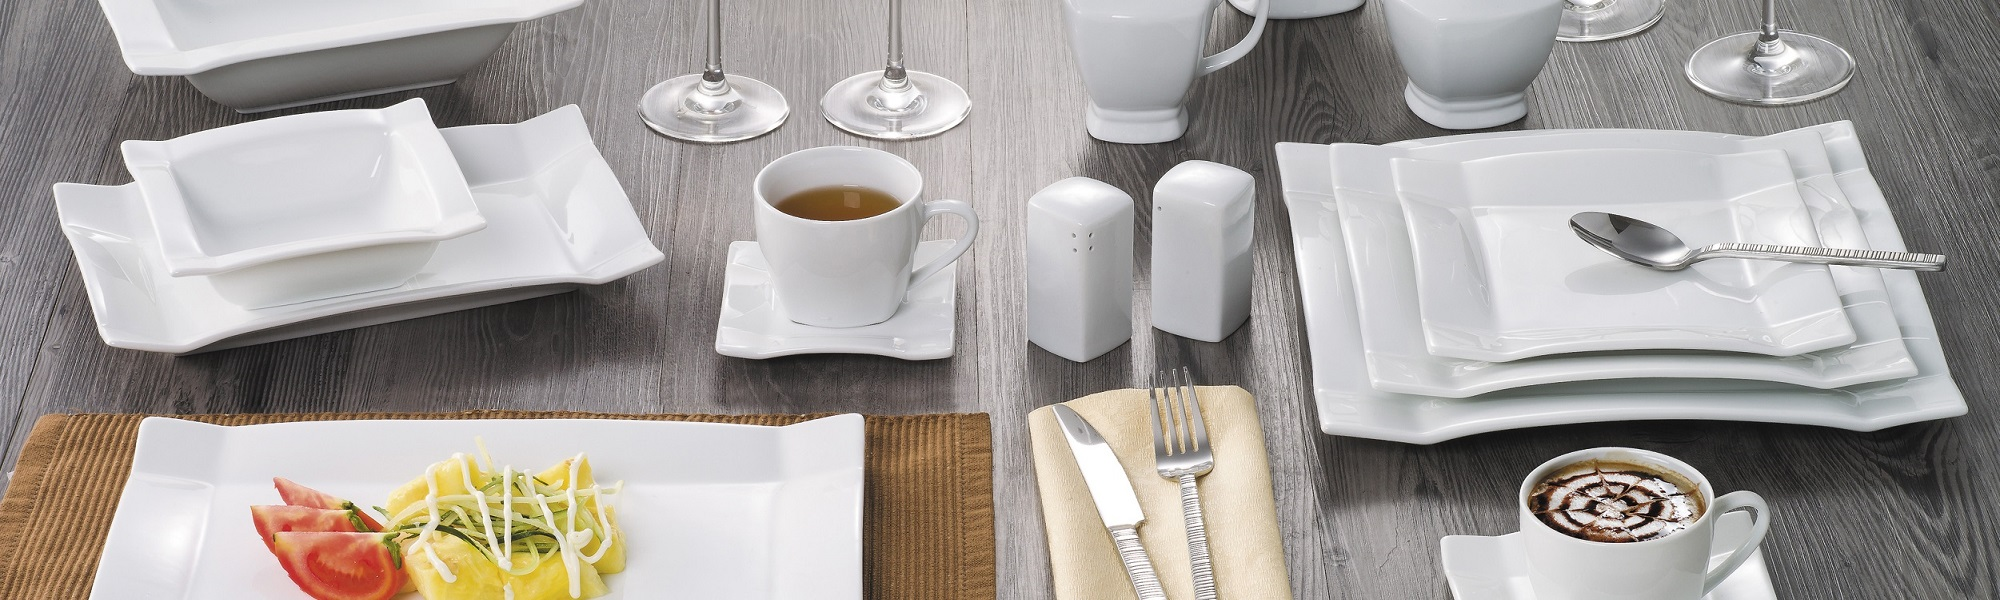 Tableware and HORECA